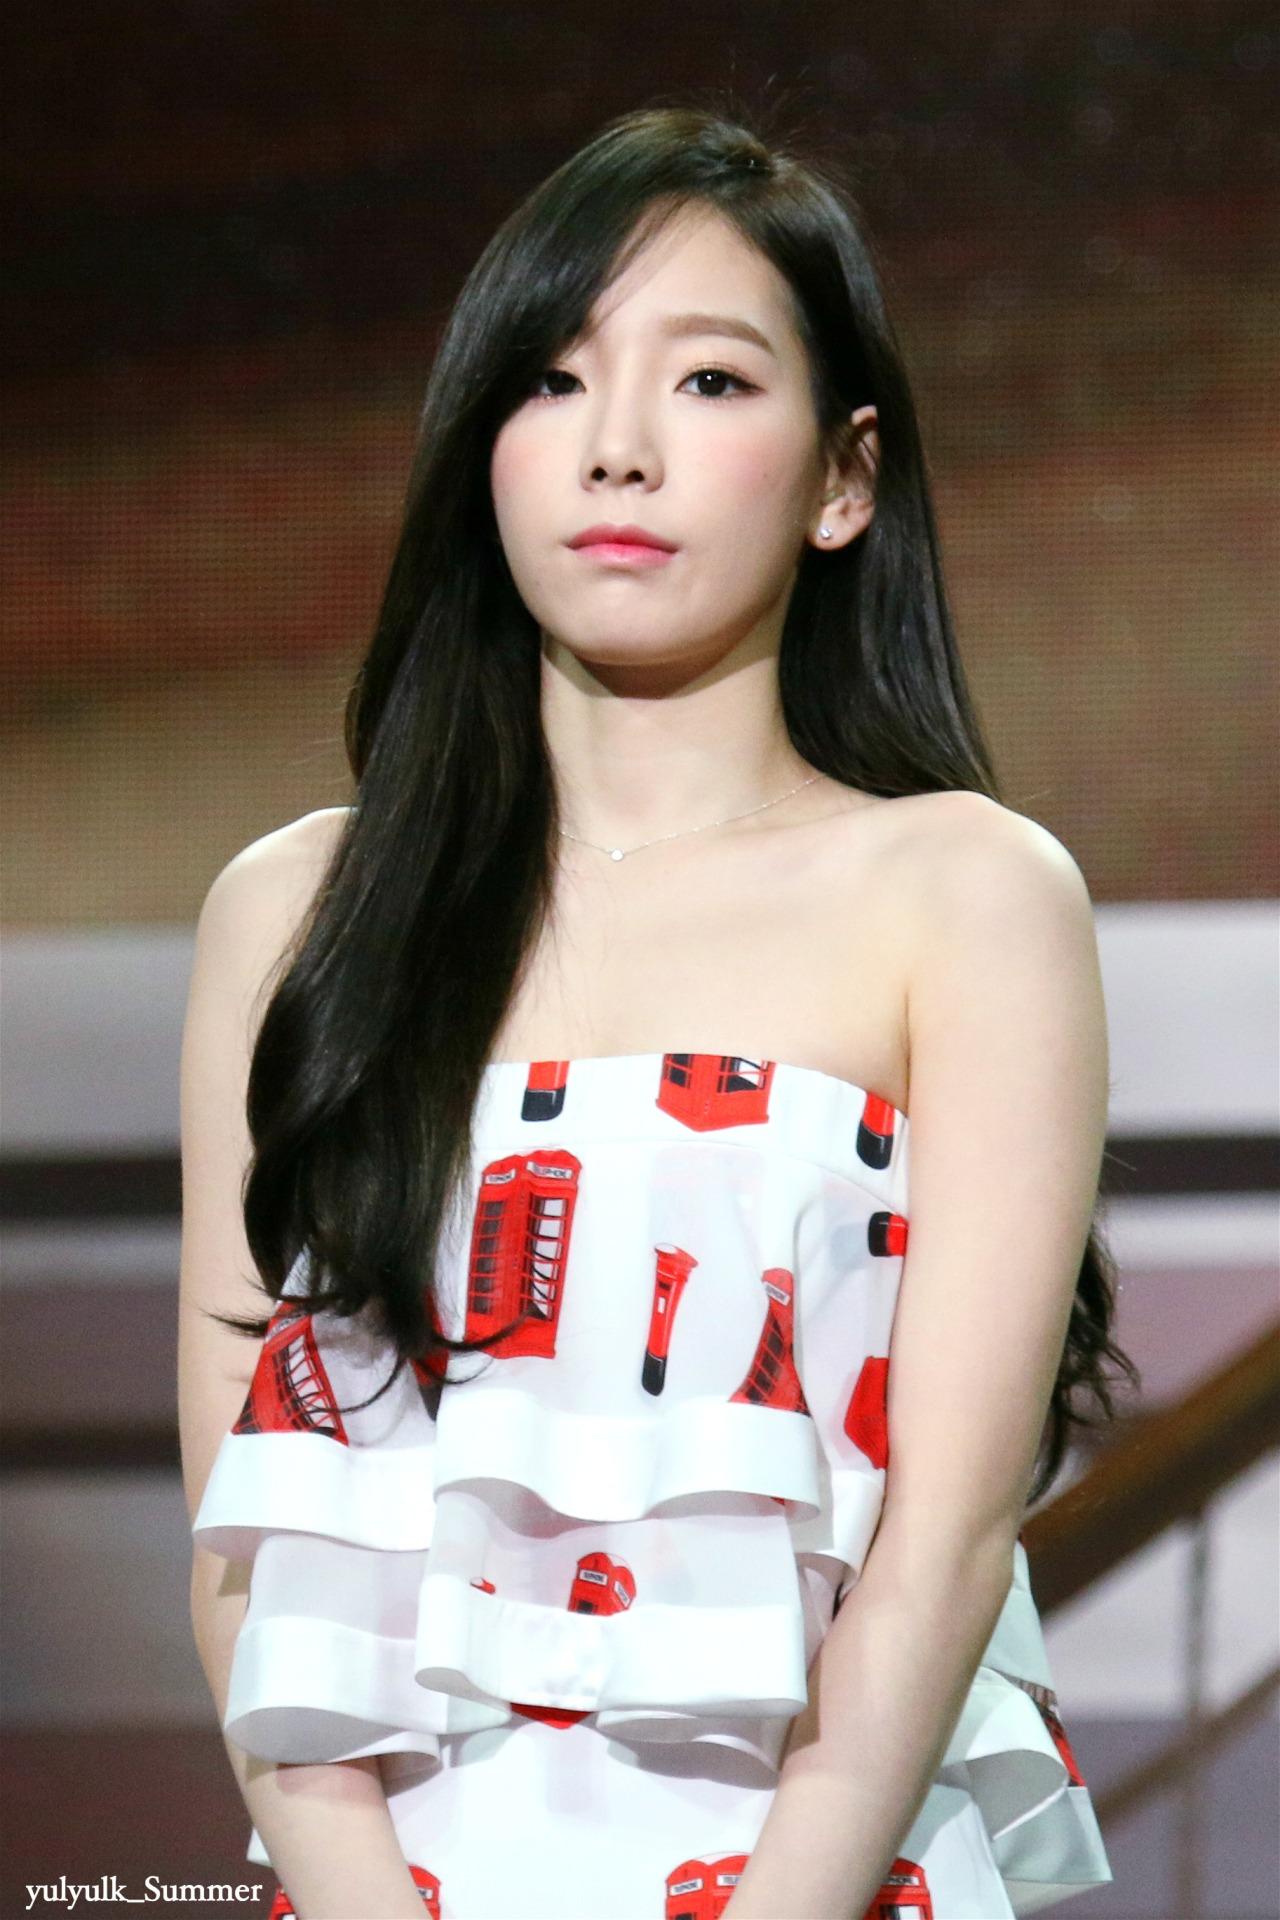 Account Wallpaper For 11 Girls Taeyeon Golden Disk Award Territorio De Taeyeon